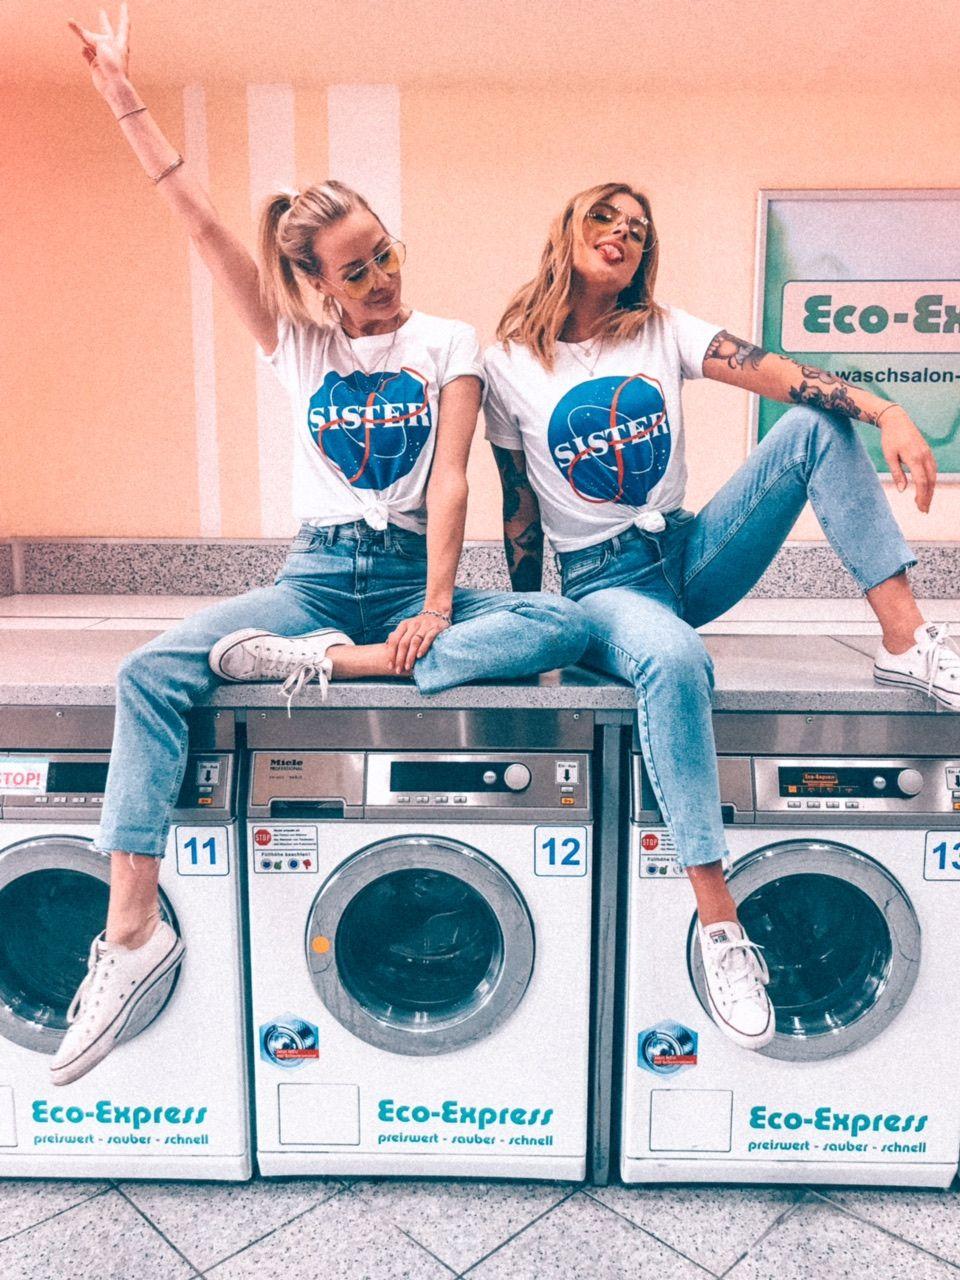 2er Set Hamburger Haenger® Sister Space T-Shirt Weiss #outfitinspo